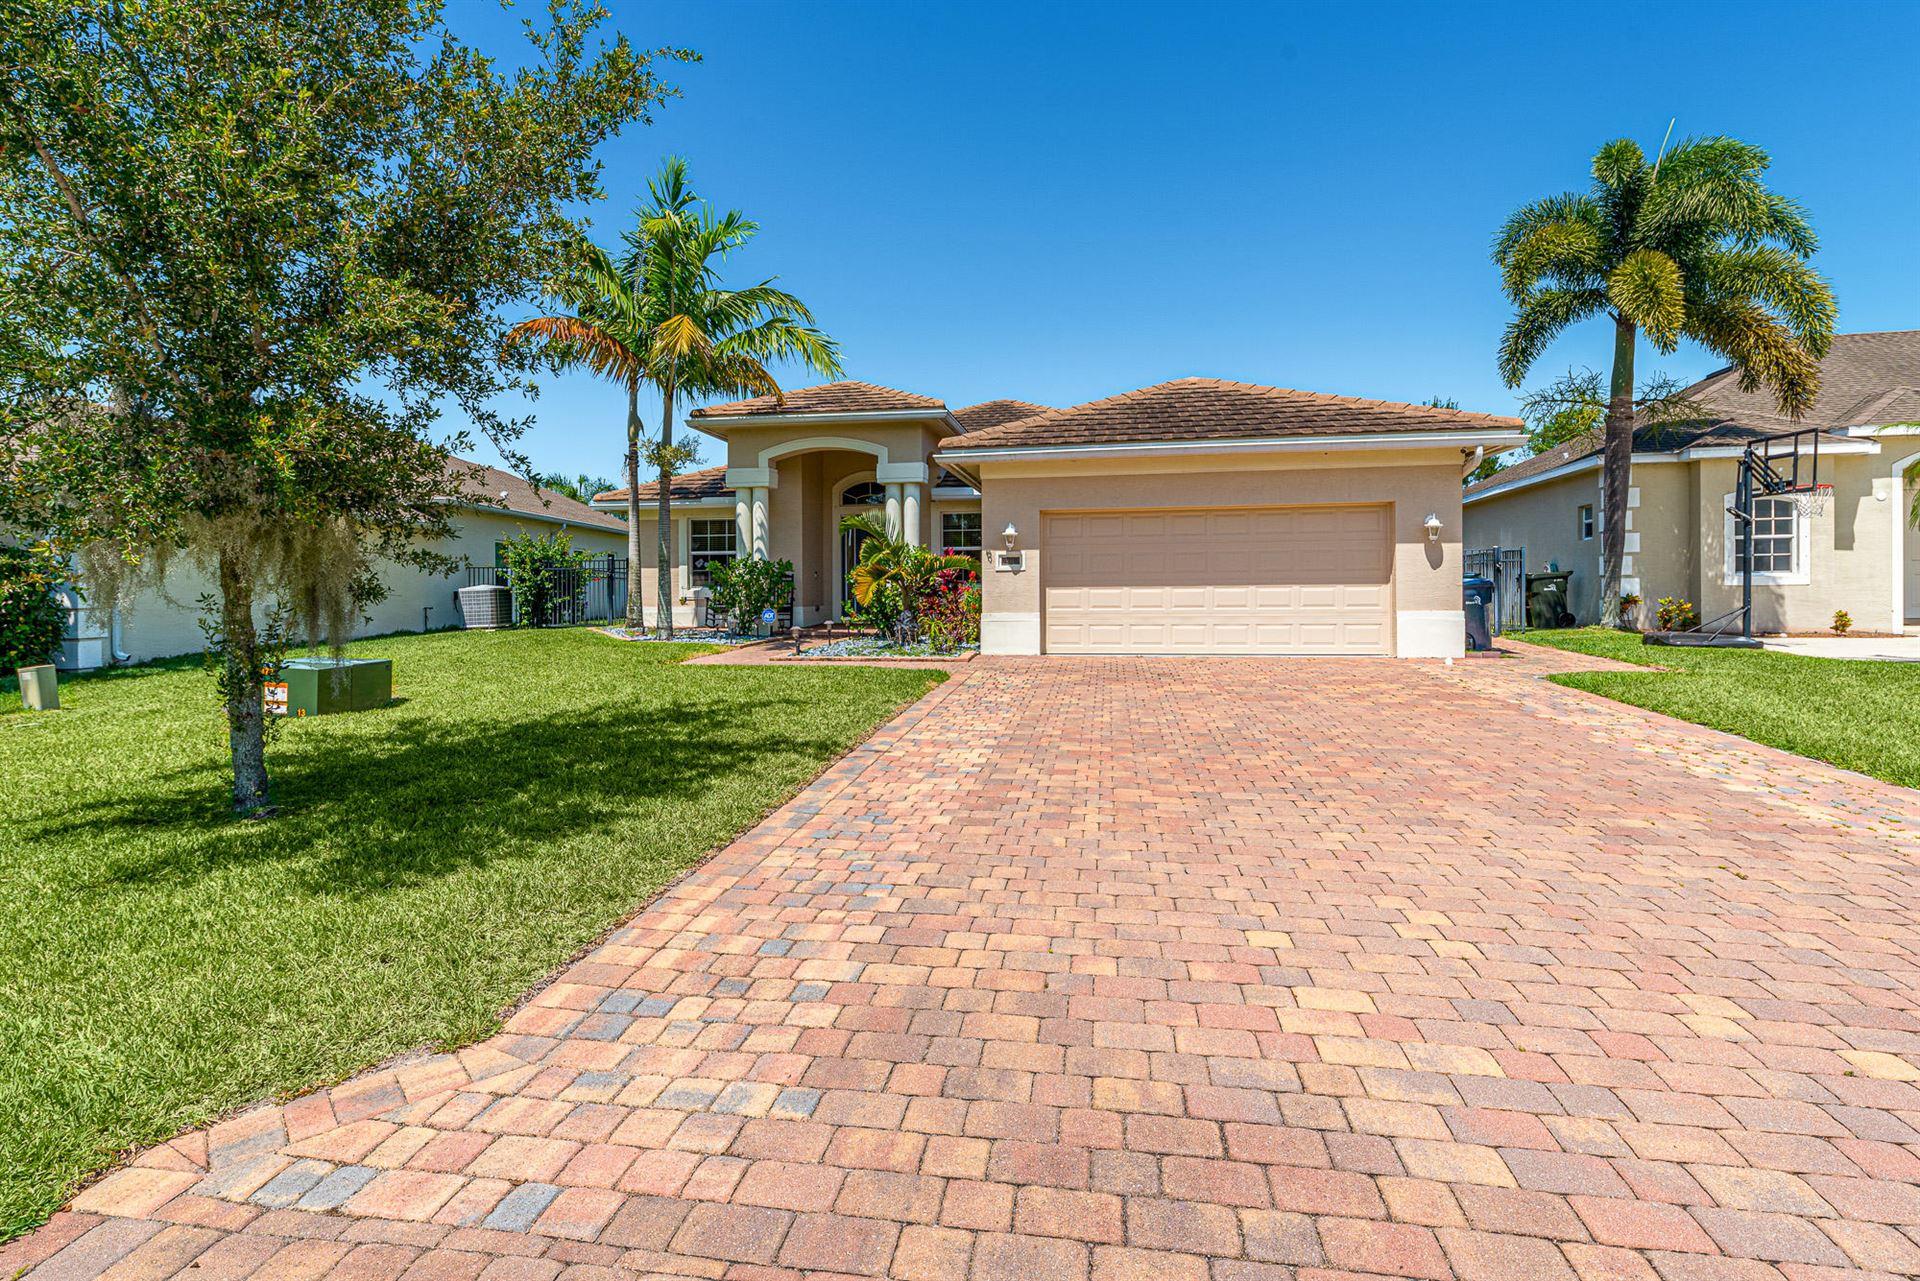 451 NW Sunflower Place, Jensen Beach, FL 34957 - MLS#: RX-10715217